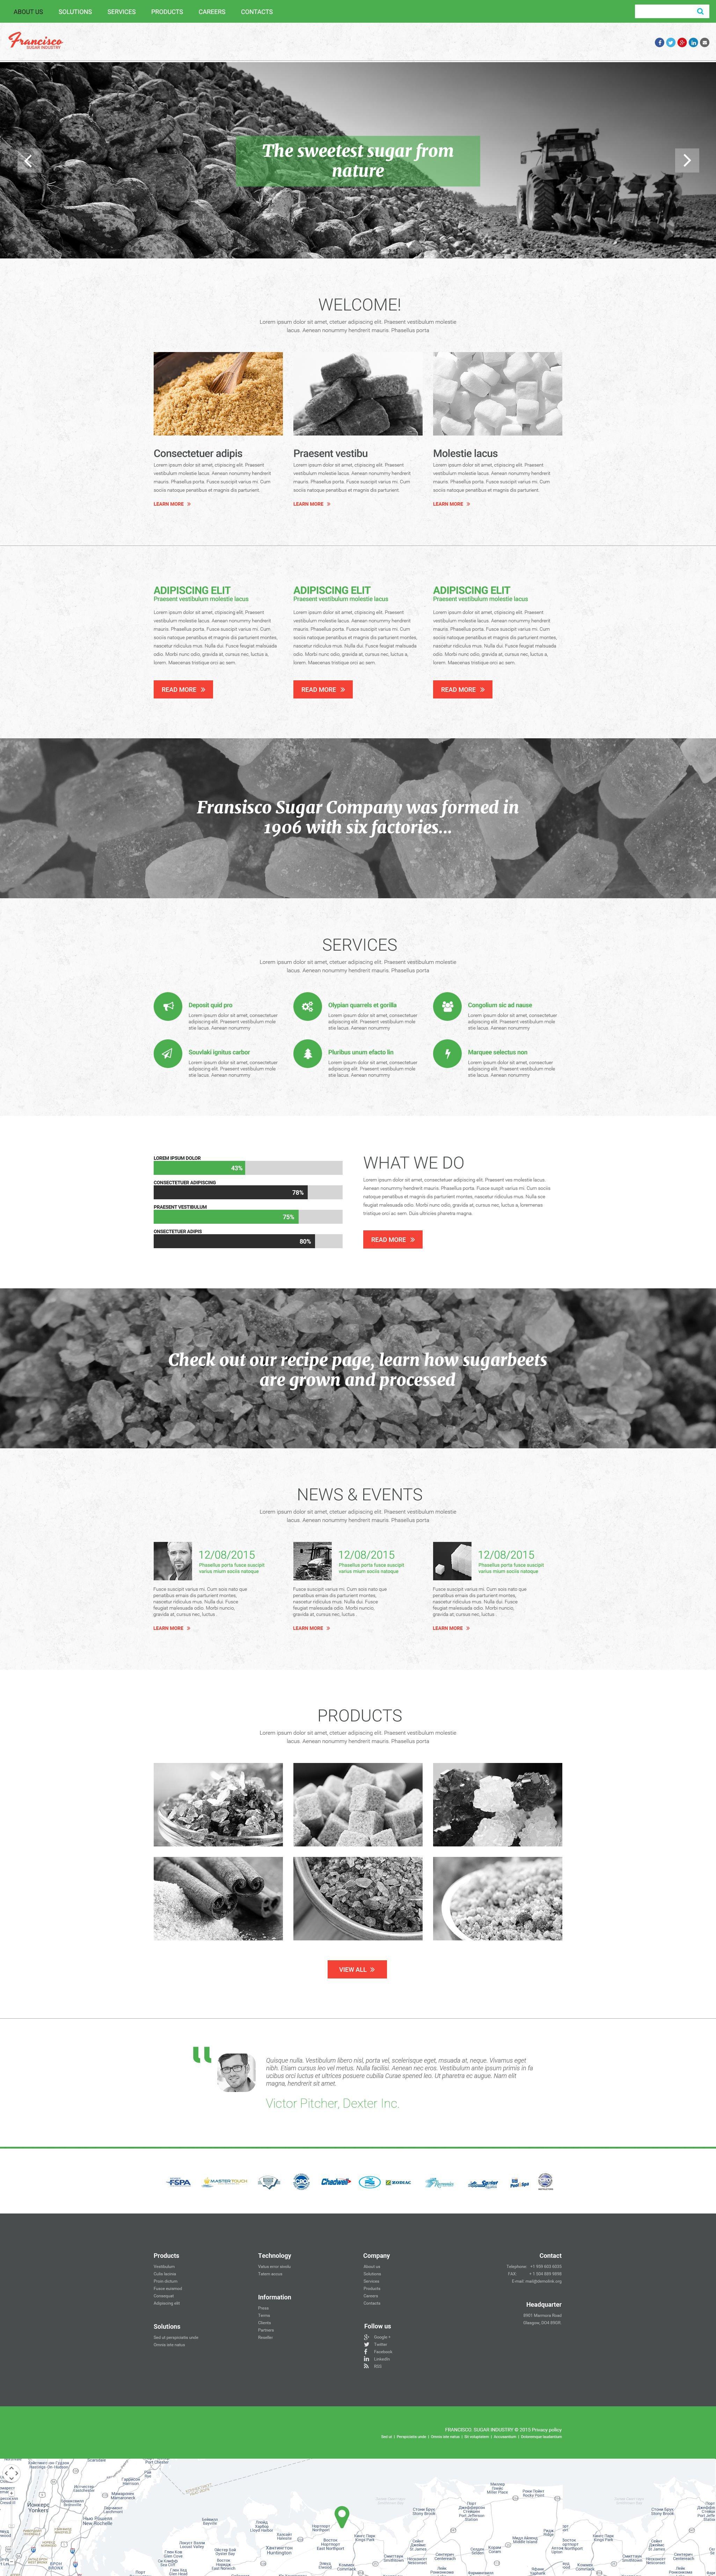 Responsive Francisco Sugar Industry Web Sitesi #55240 - Ekran resmi